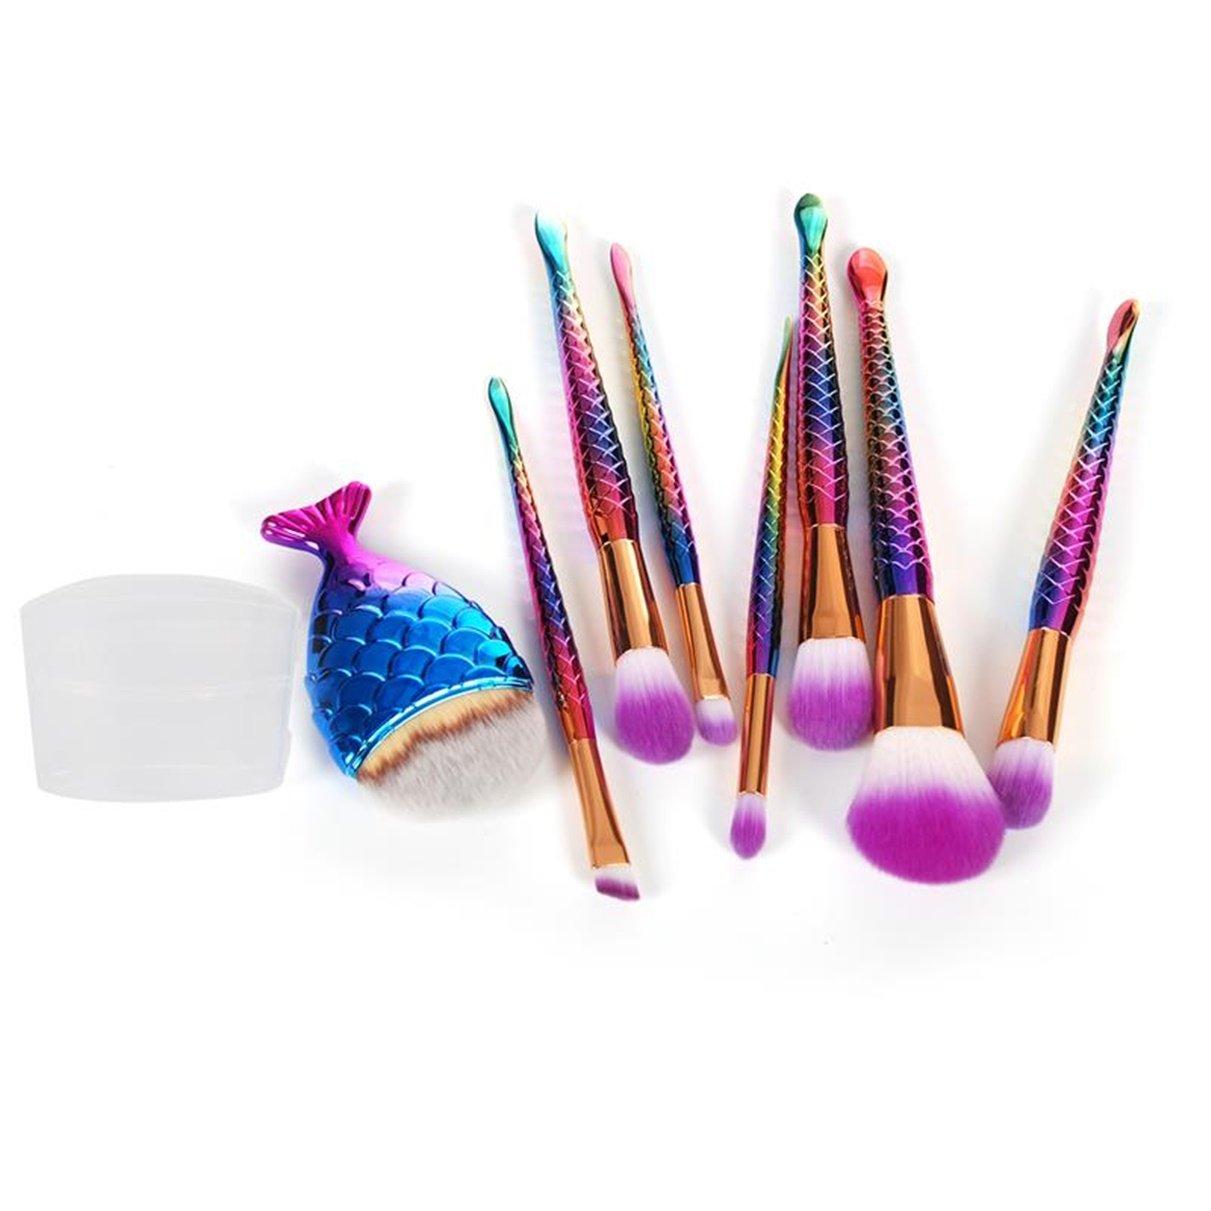 8 Pcs Mermaid Fish Tail Makeup Brush Set Powder Eyeshadow Contour Blending Cosmetic Tool Foundation Natural Beauty Palettes Vanity Dazzling Popular Face Colorful Rainbow Hair Highlights Kit, Type-02 61ktbzobIhL